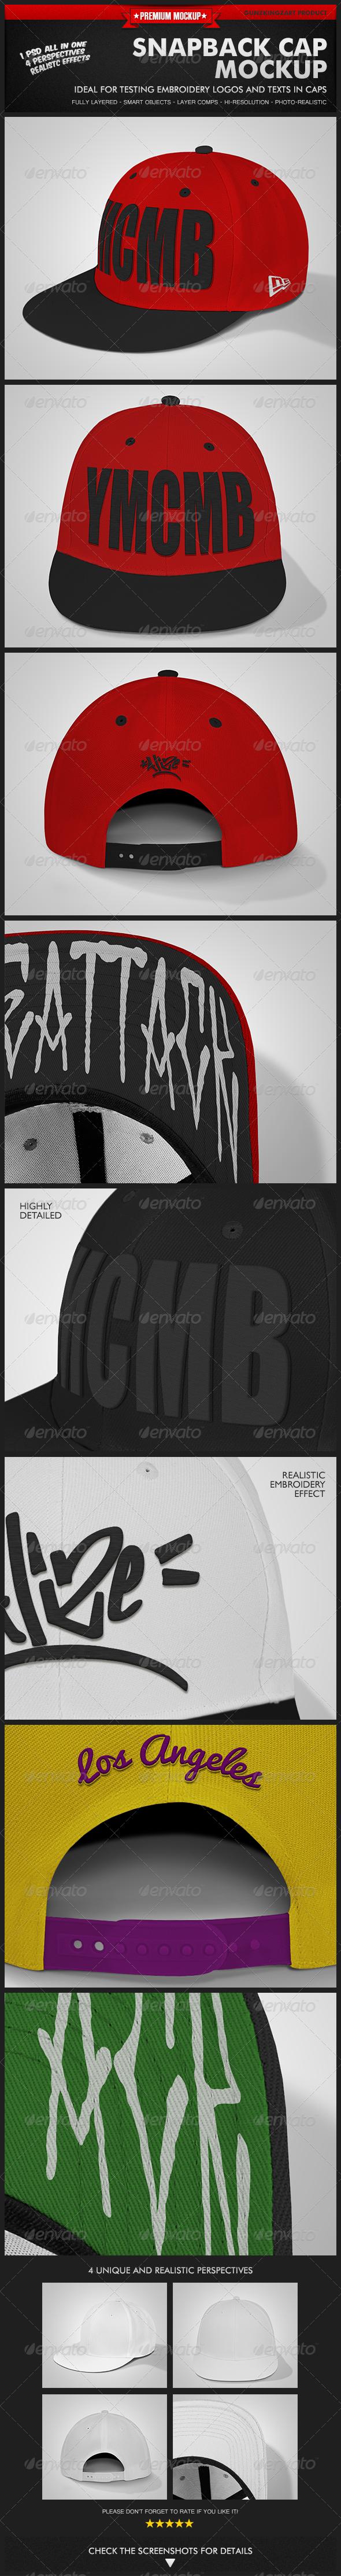 GraphicRiver Snapback Cap Mockup 5633381